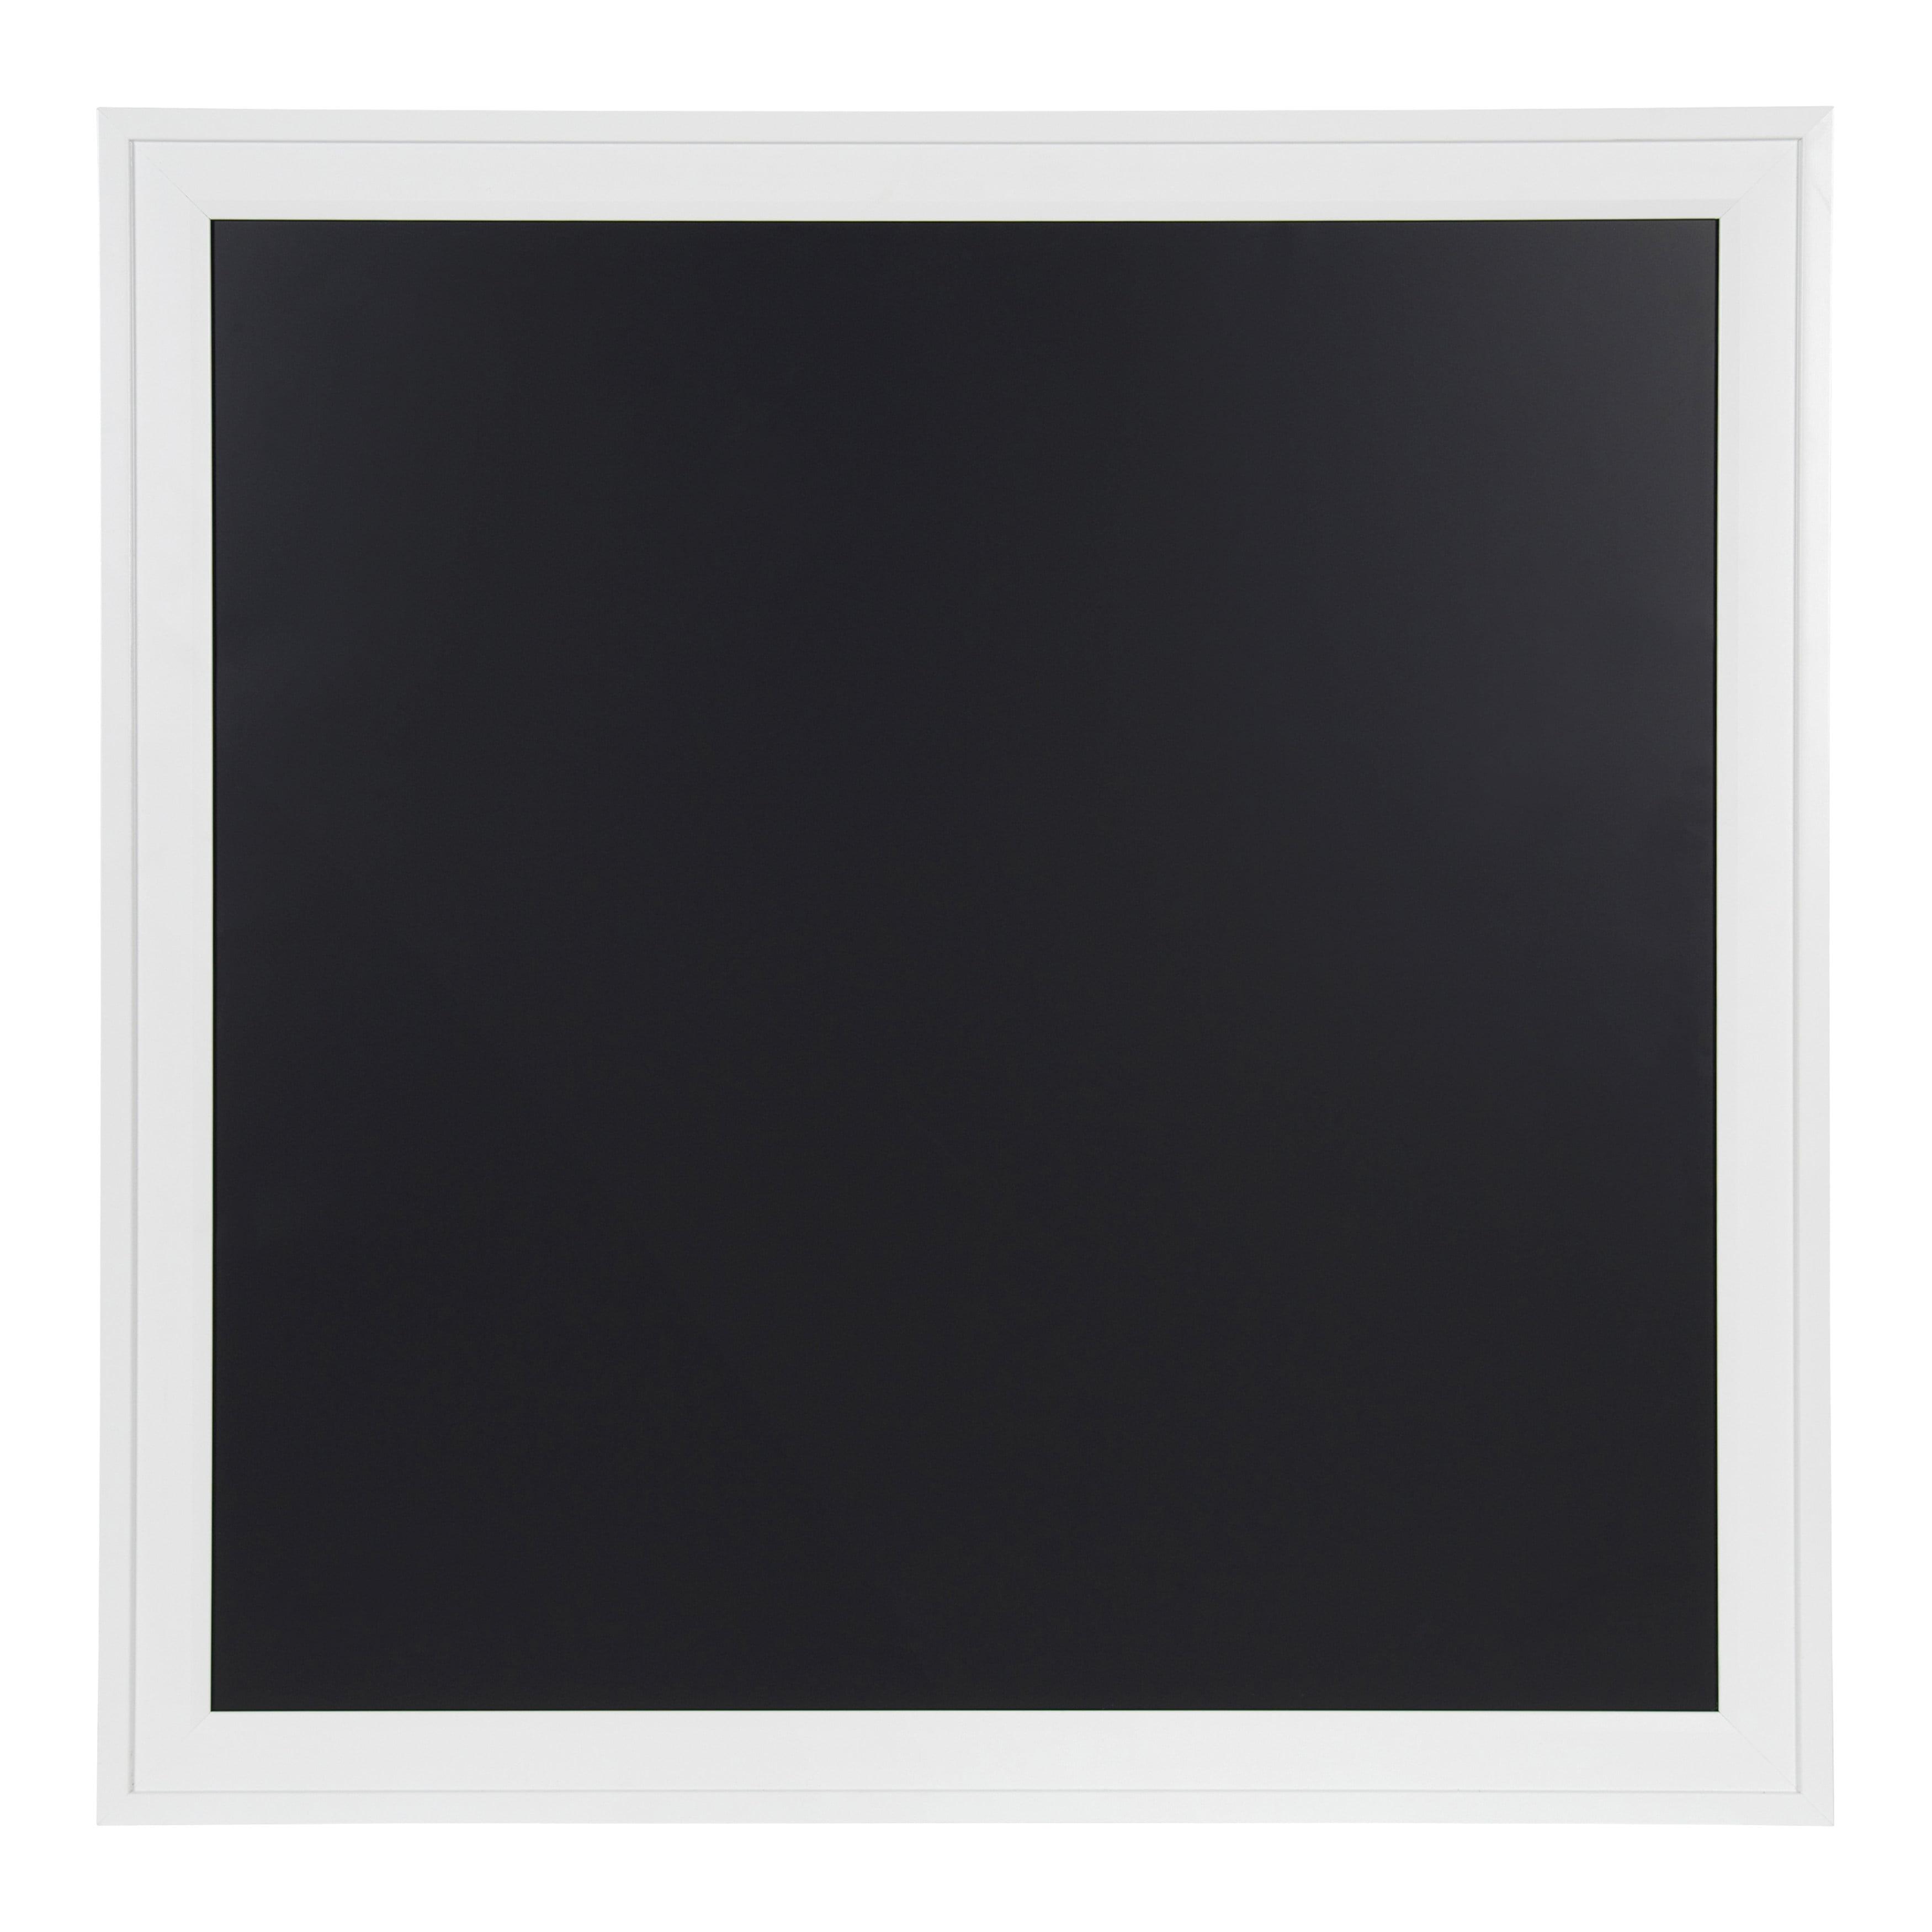 DesignOvation Bosc Square Framed Magnetic Chalkboard, 31.5x31.5, White by Uniek